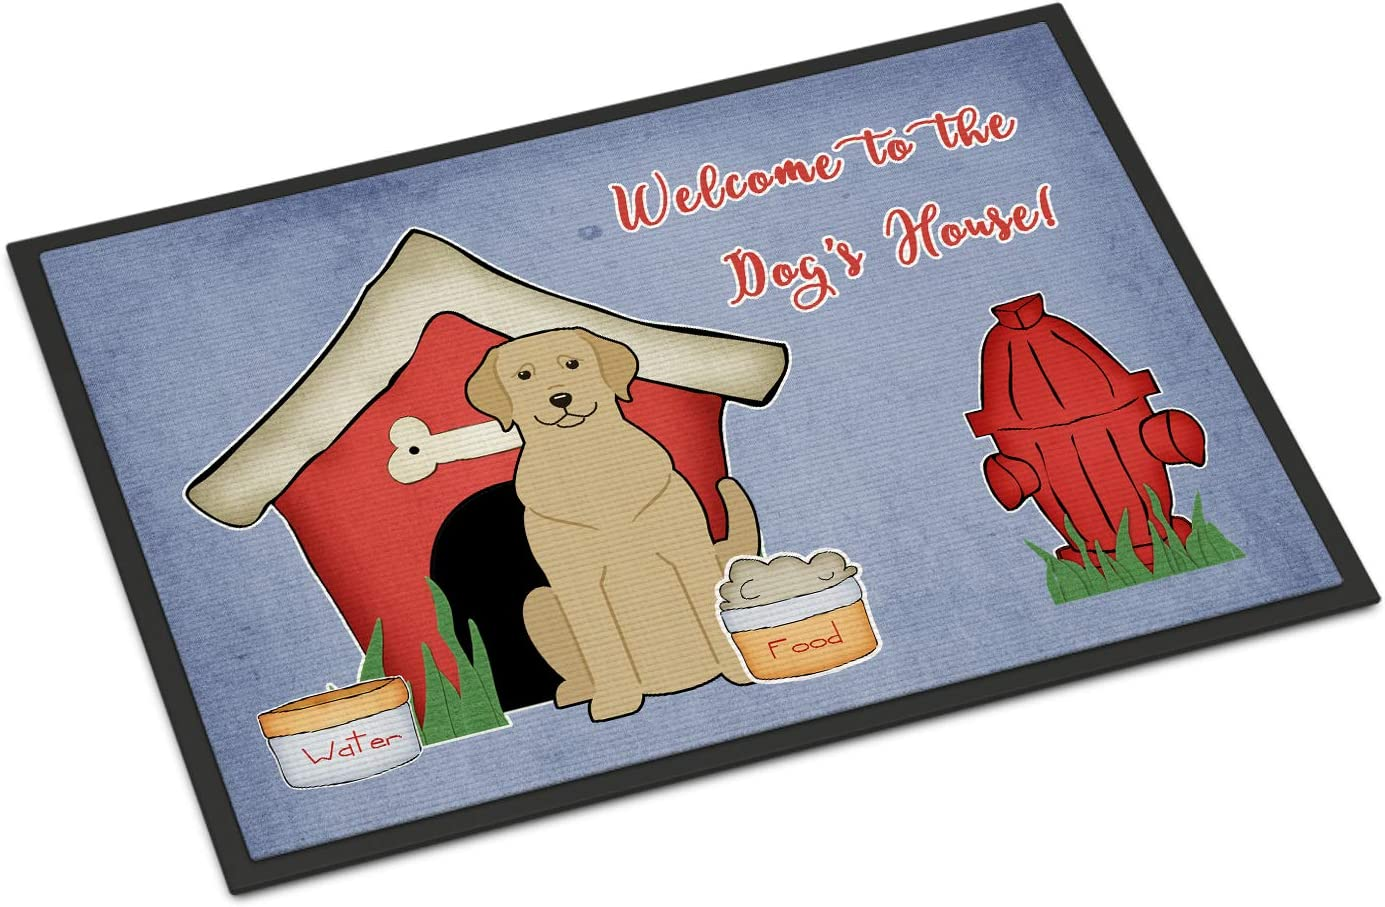 Carolines Treasures Dog House Collection Flashy Fawn Boxer Floor Mat 19 x 27 Multicolor